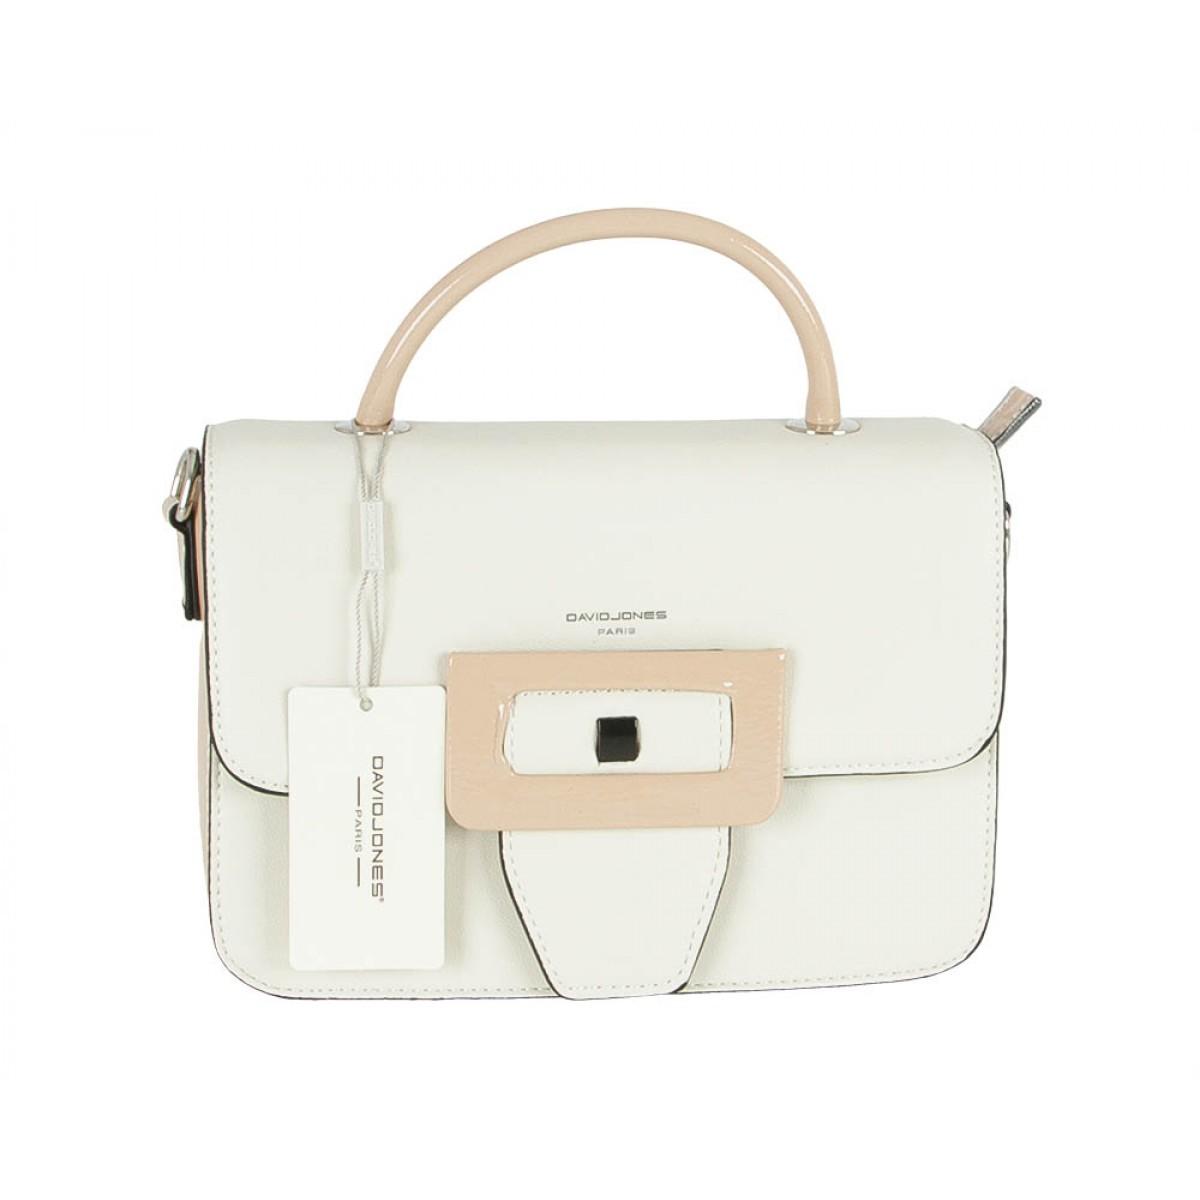 Жіноча сумка David Jones 5927-2 WHITE